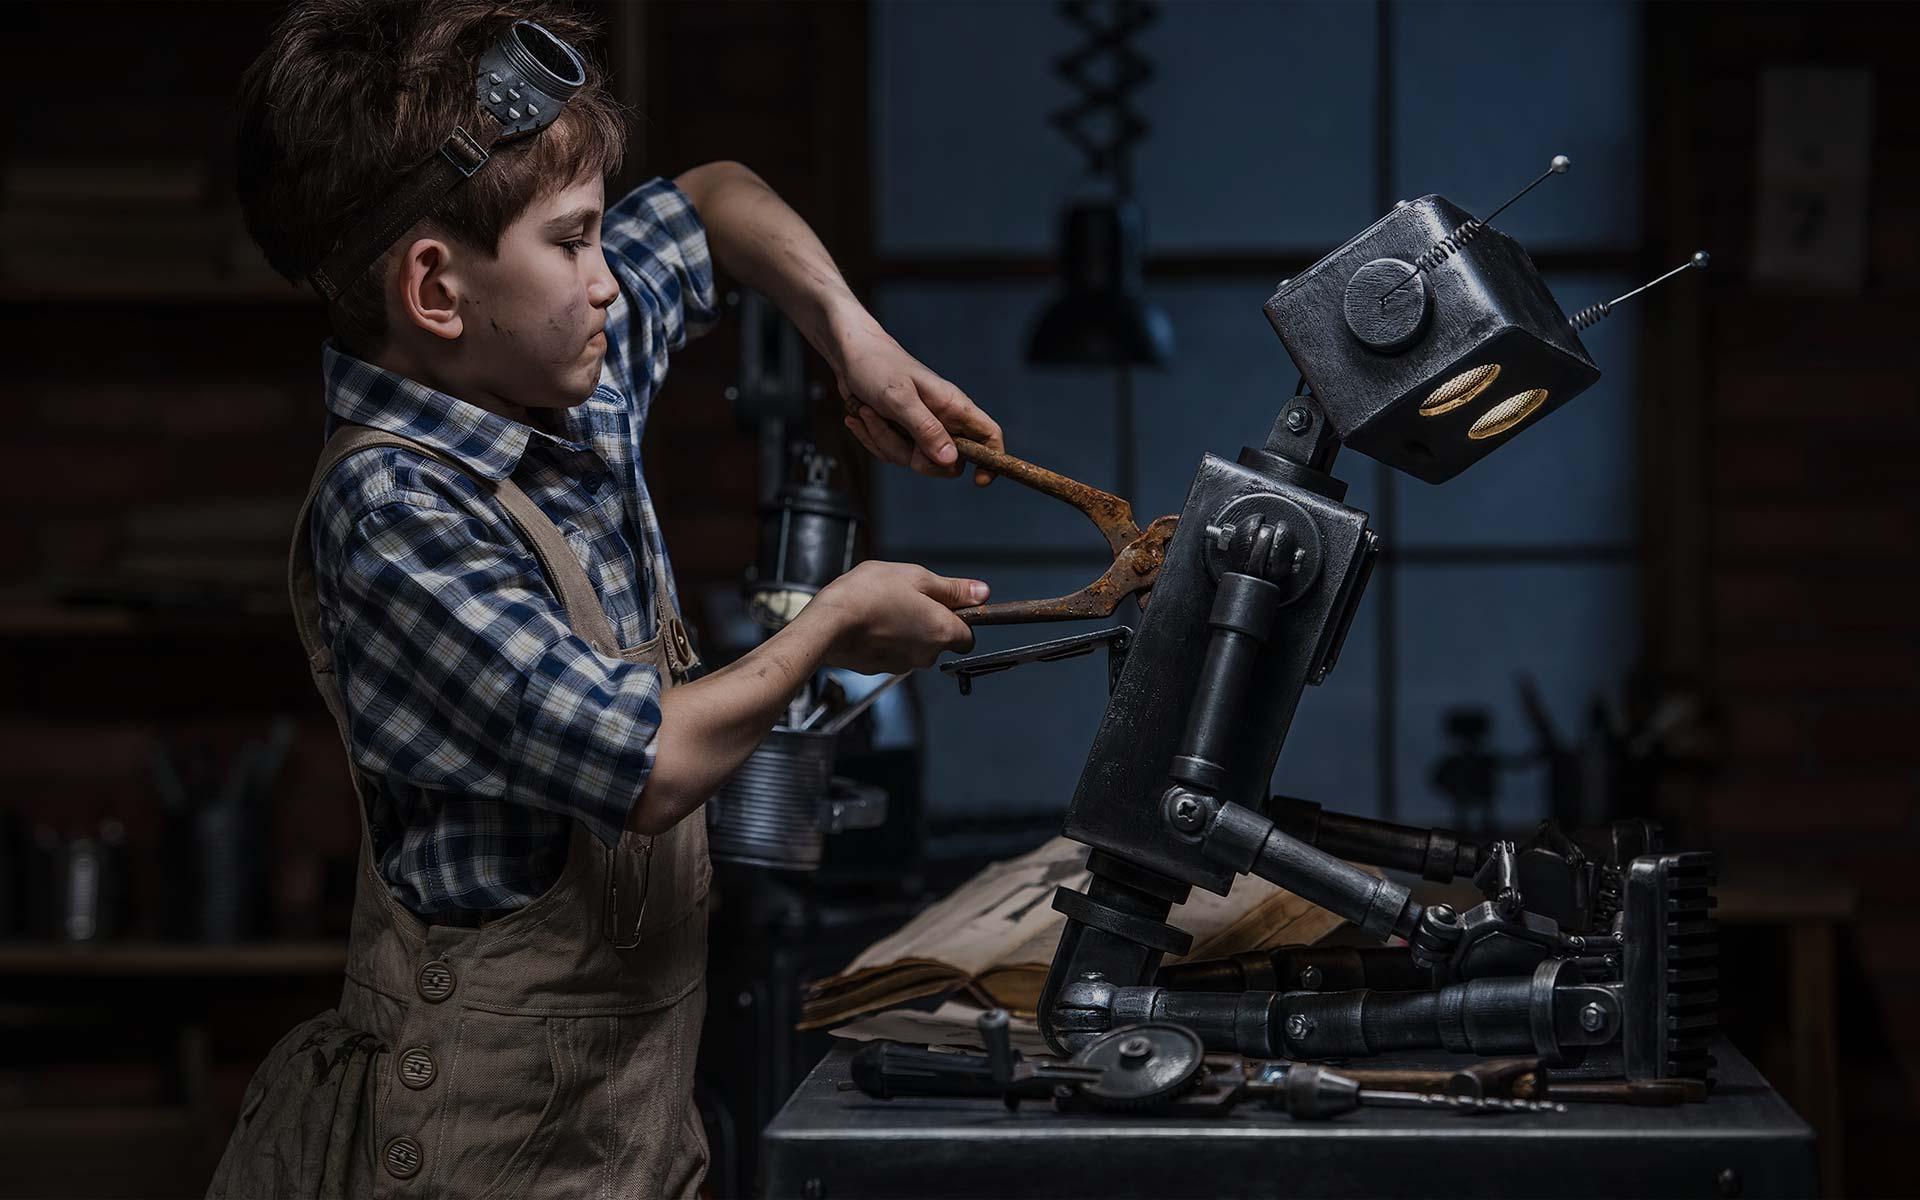 Digital Fucina - Laboratorio Artigianale Digitale